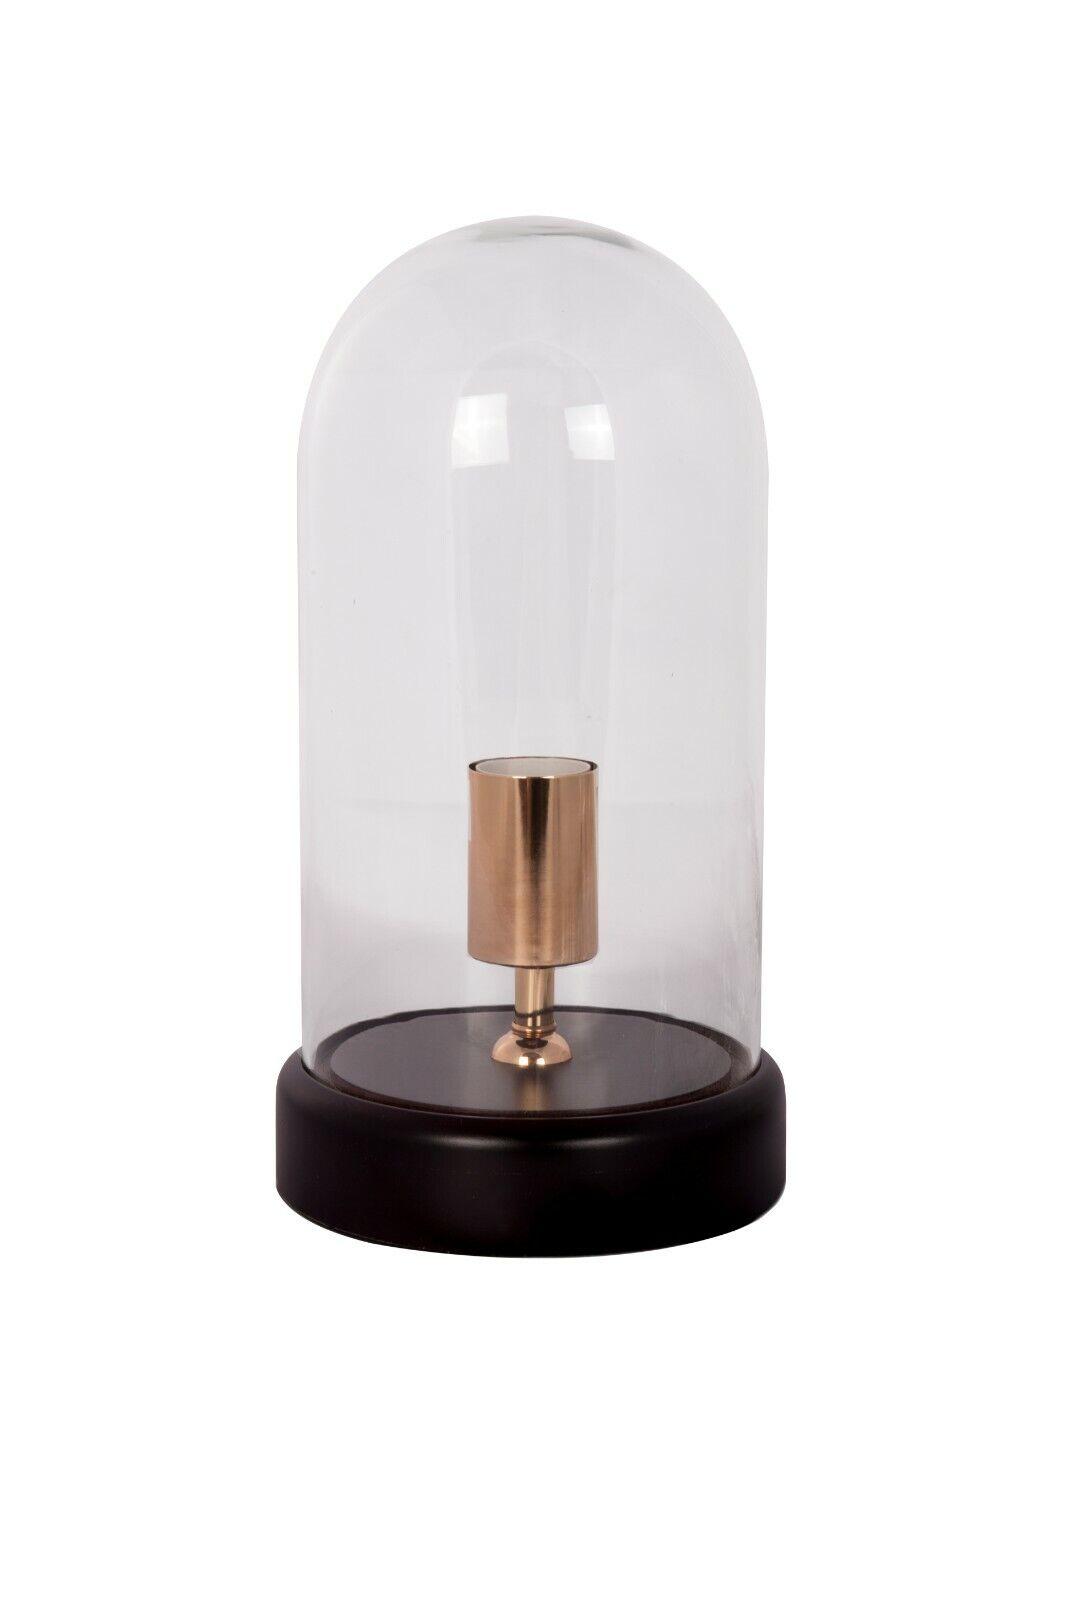 Tischlampe Ceti 310 Transparent E27 Max. 40 Watt Lampe Leuchte Glas Holz